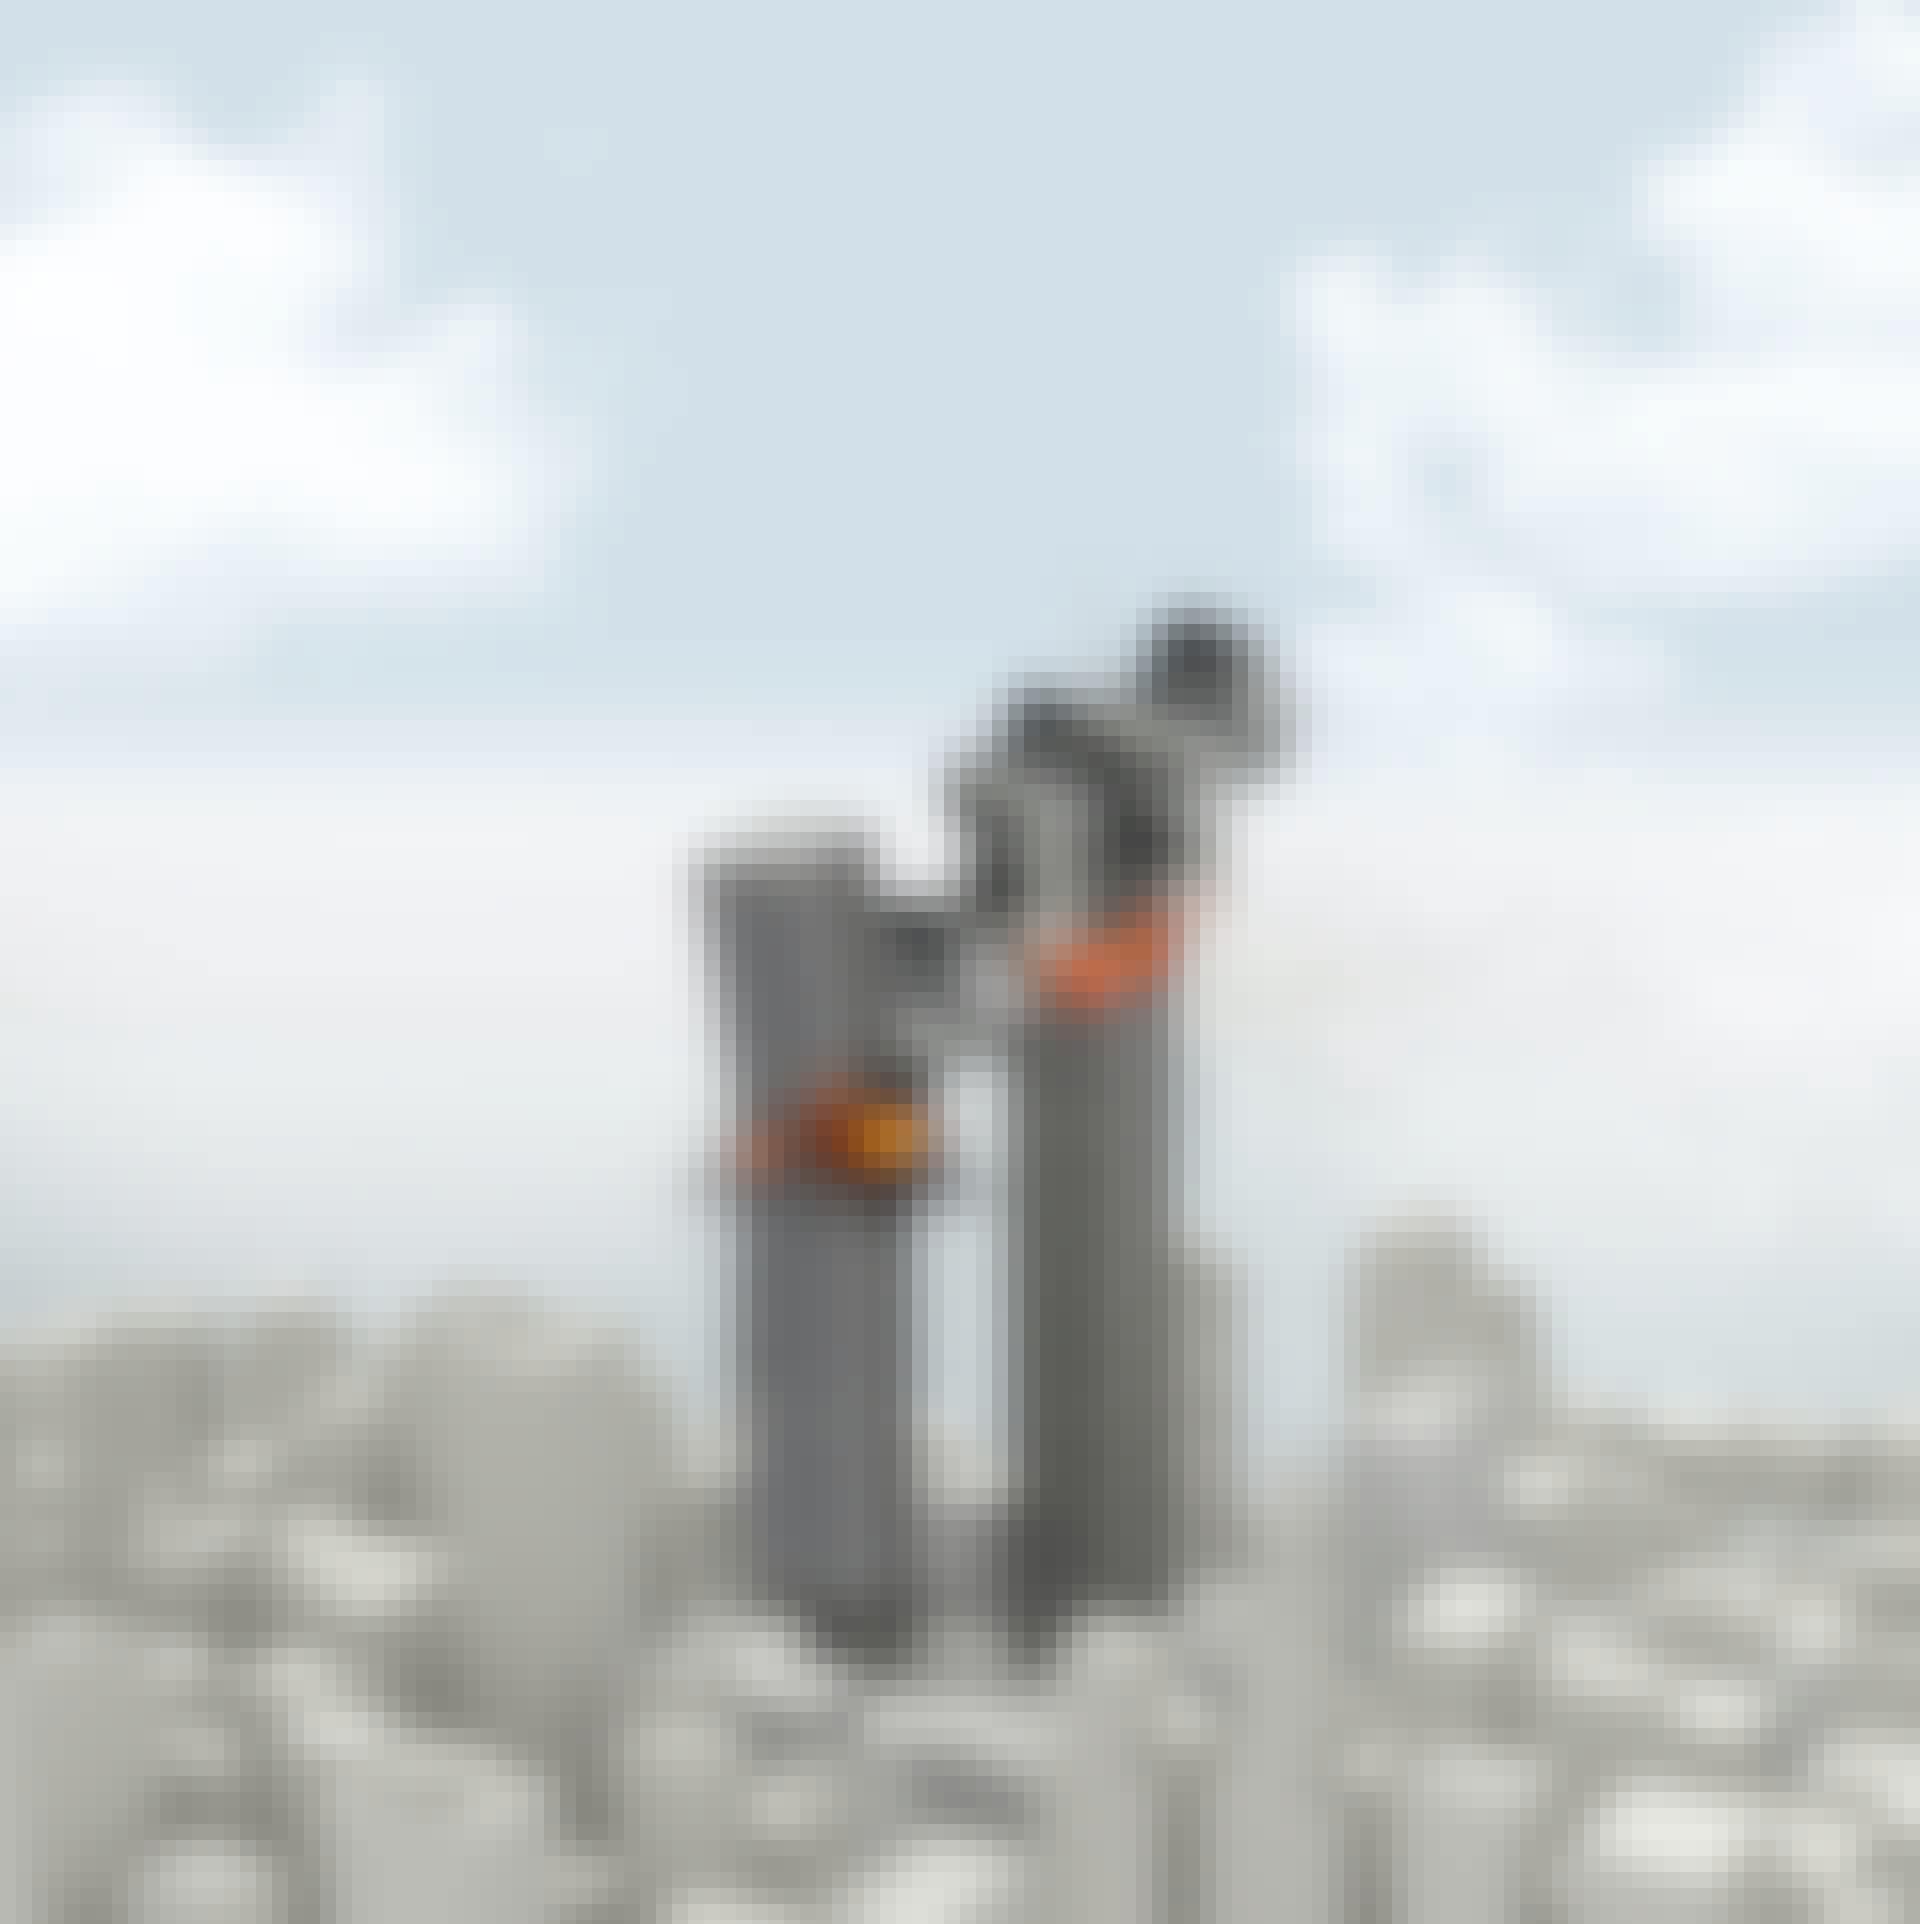 Tornit sortuvat: Vaihe 3